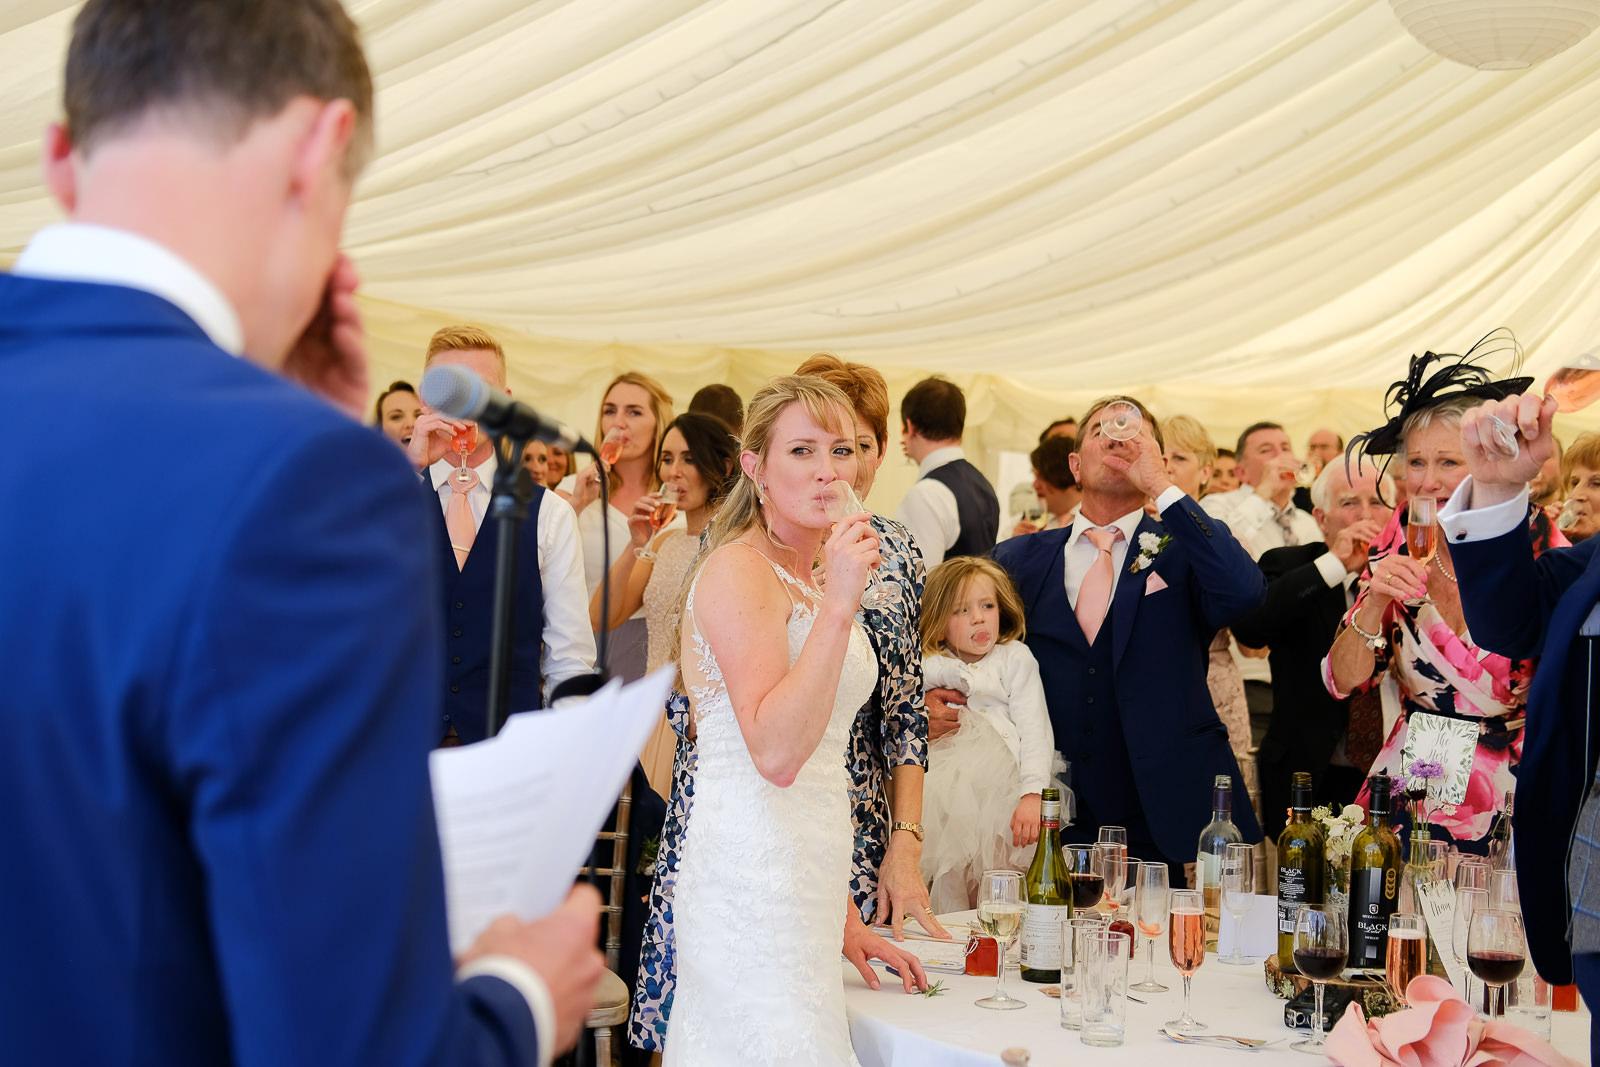 Roscarrock Farm wedding in Cornwall 058.jpg